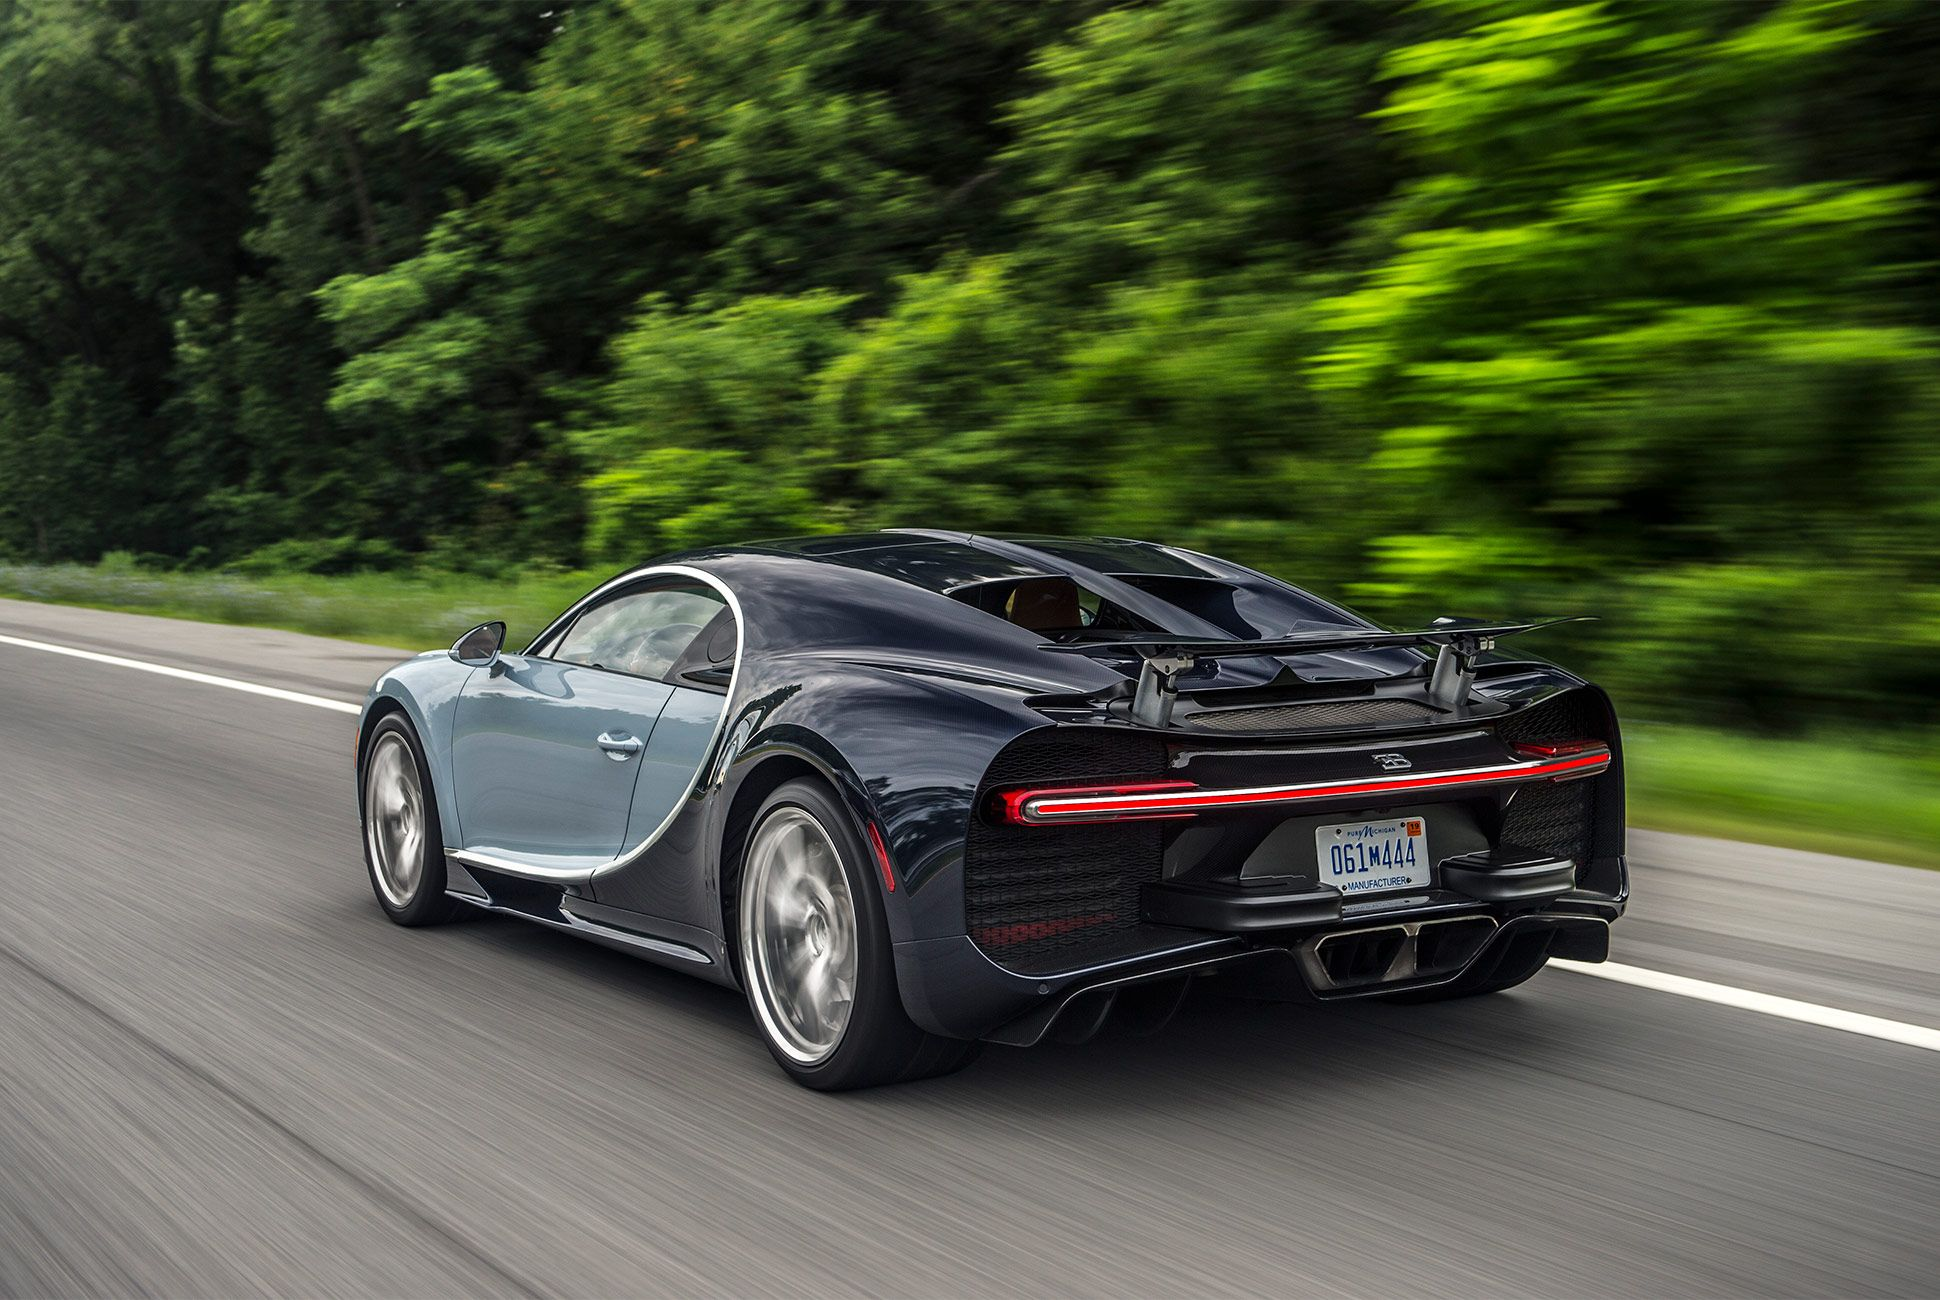 First Drive: 2018 Bugatti Chiron Hypercar - Gear Patrol